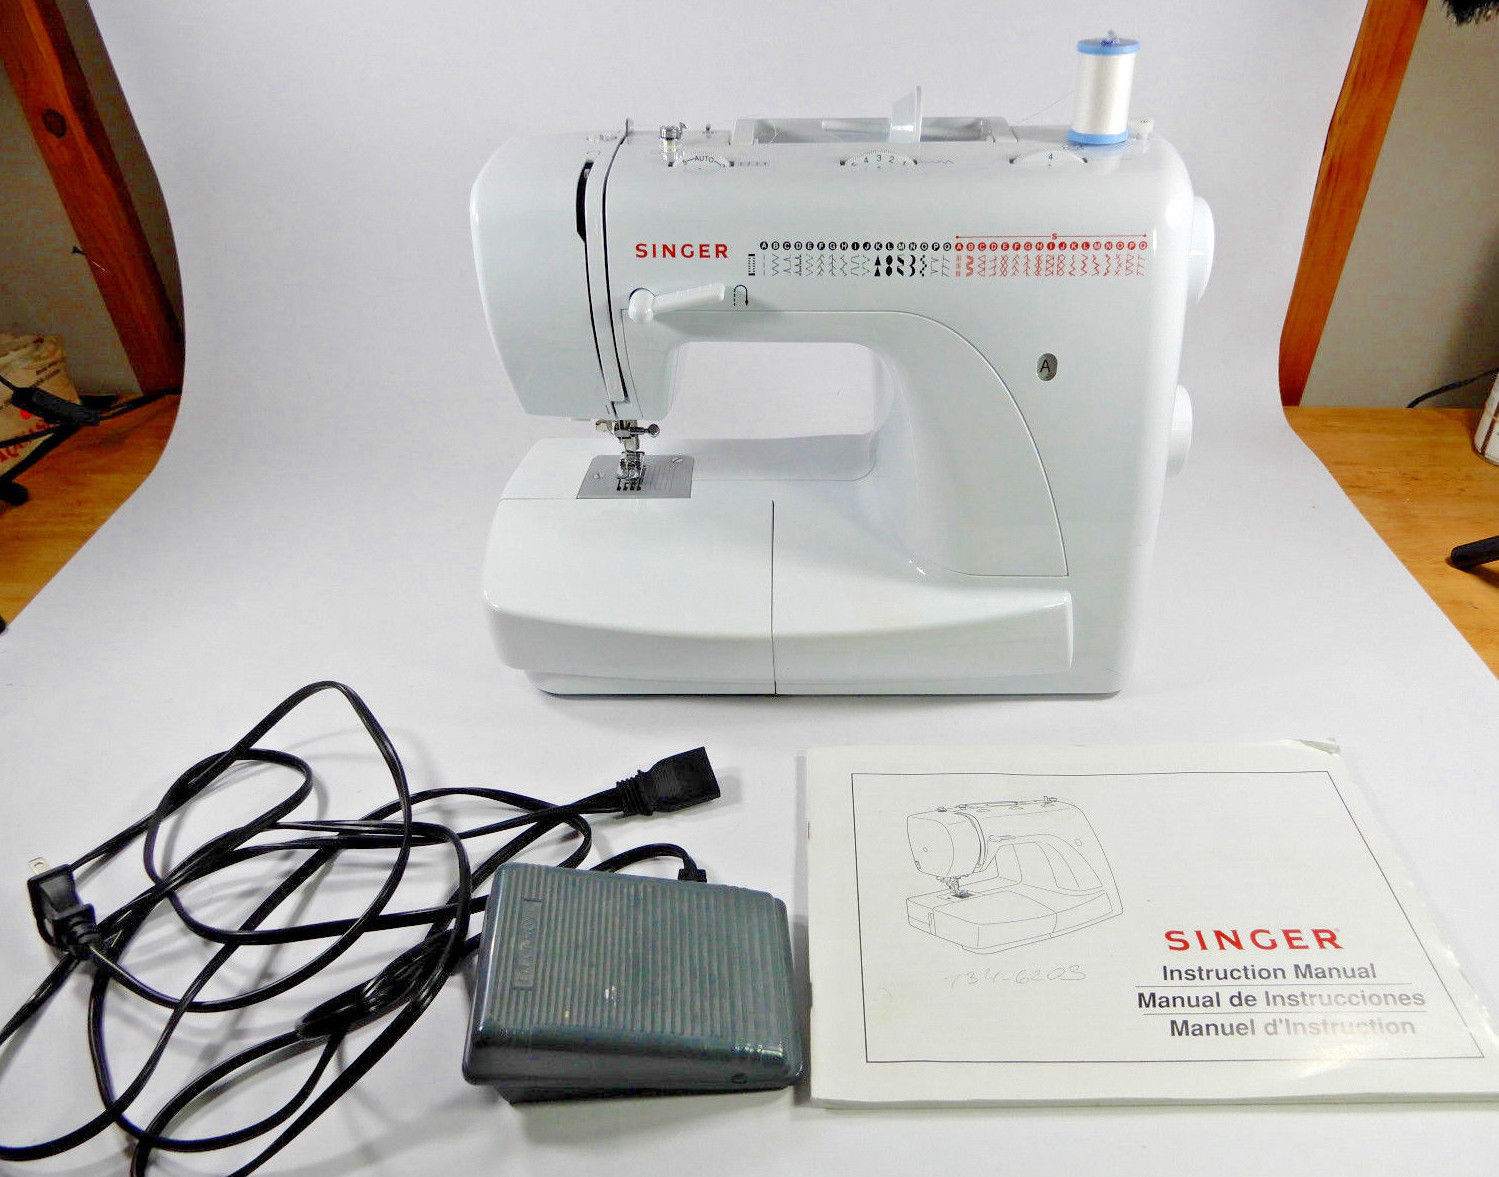 singer 2932 sewing machine 35 built in and 17 similar items rh bonanza com Antique Singer Sewing Machine Singer 160th Anniversary Machine